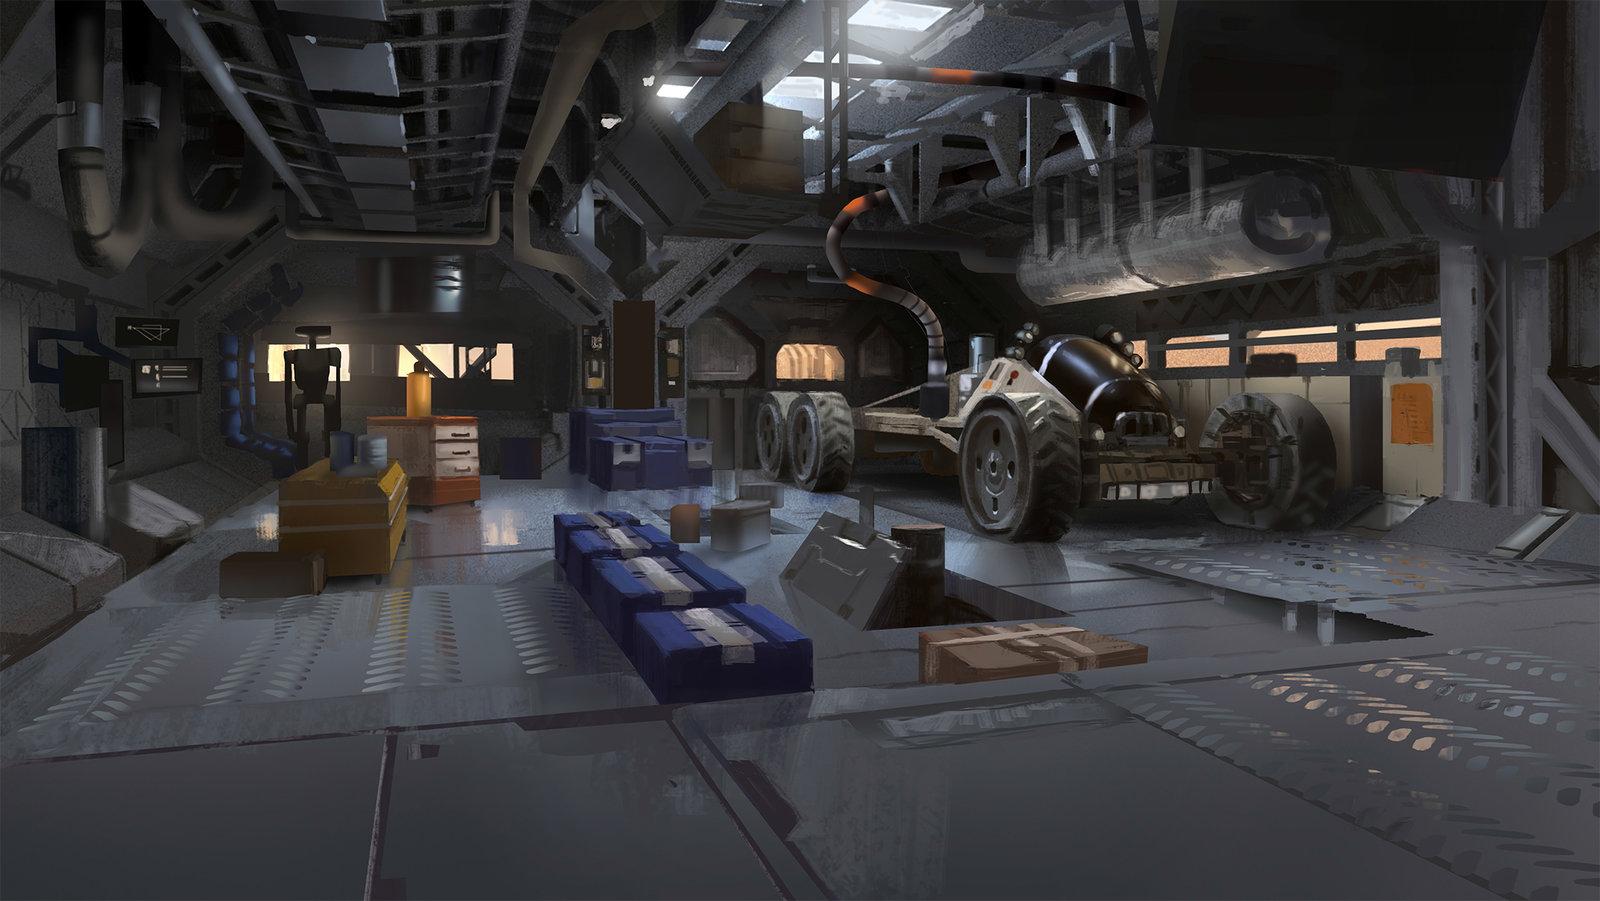 Mars Station - Maintenance Room